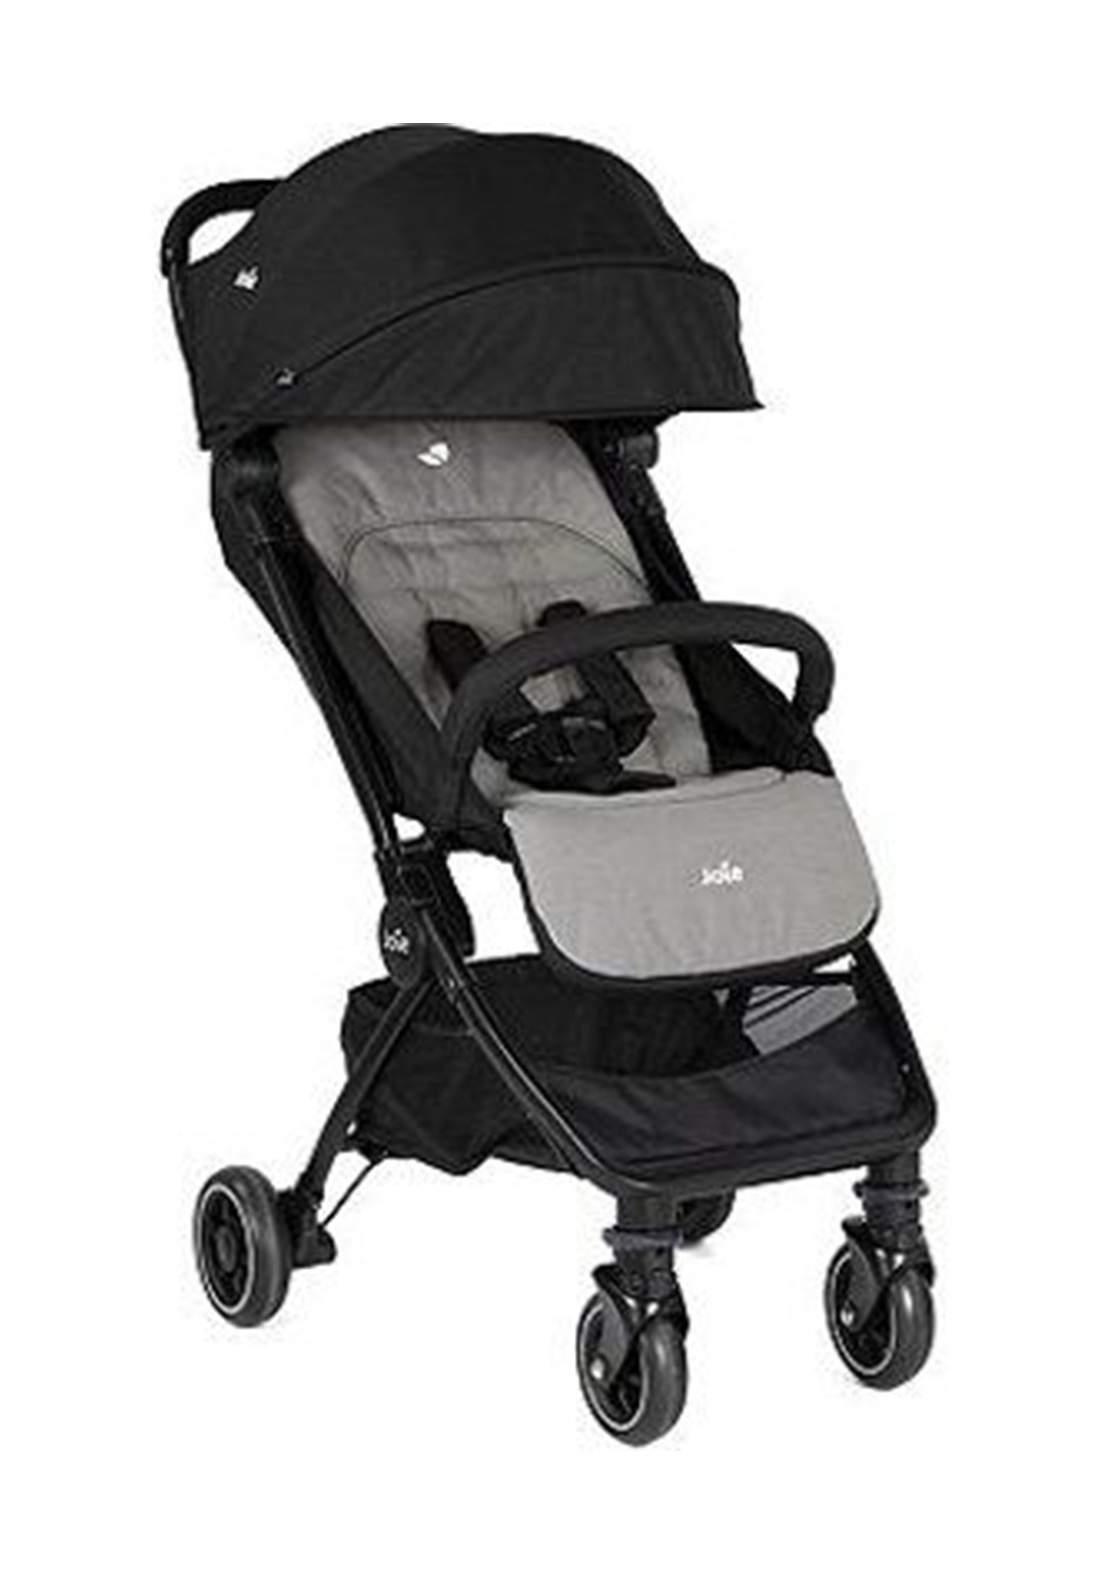 عربة اطفال 15 كغم Joie Baby S1601DAEMB000 Pact Stroller - Ember